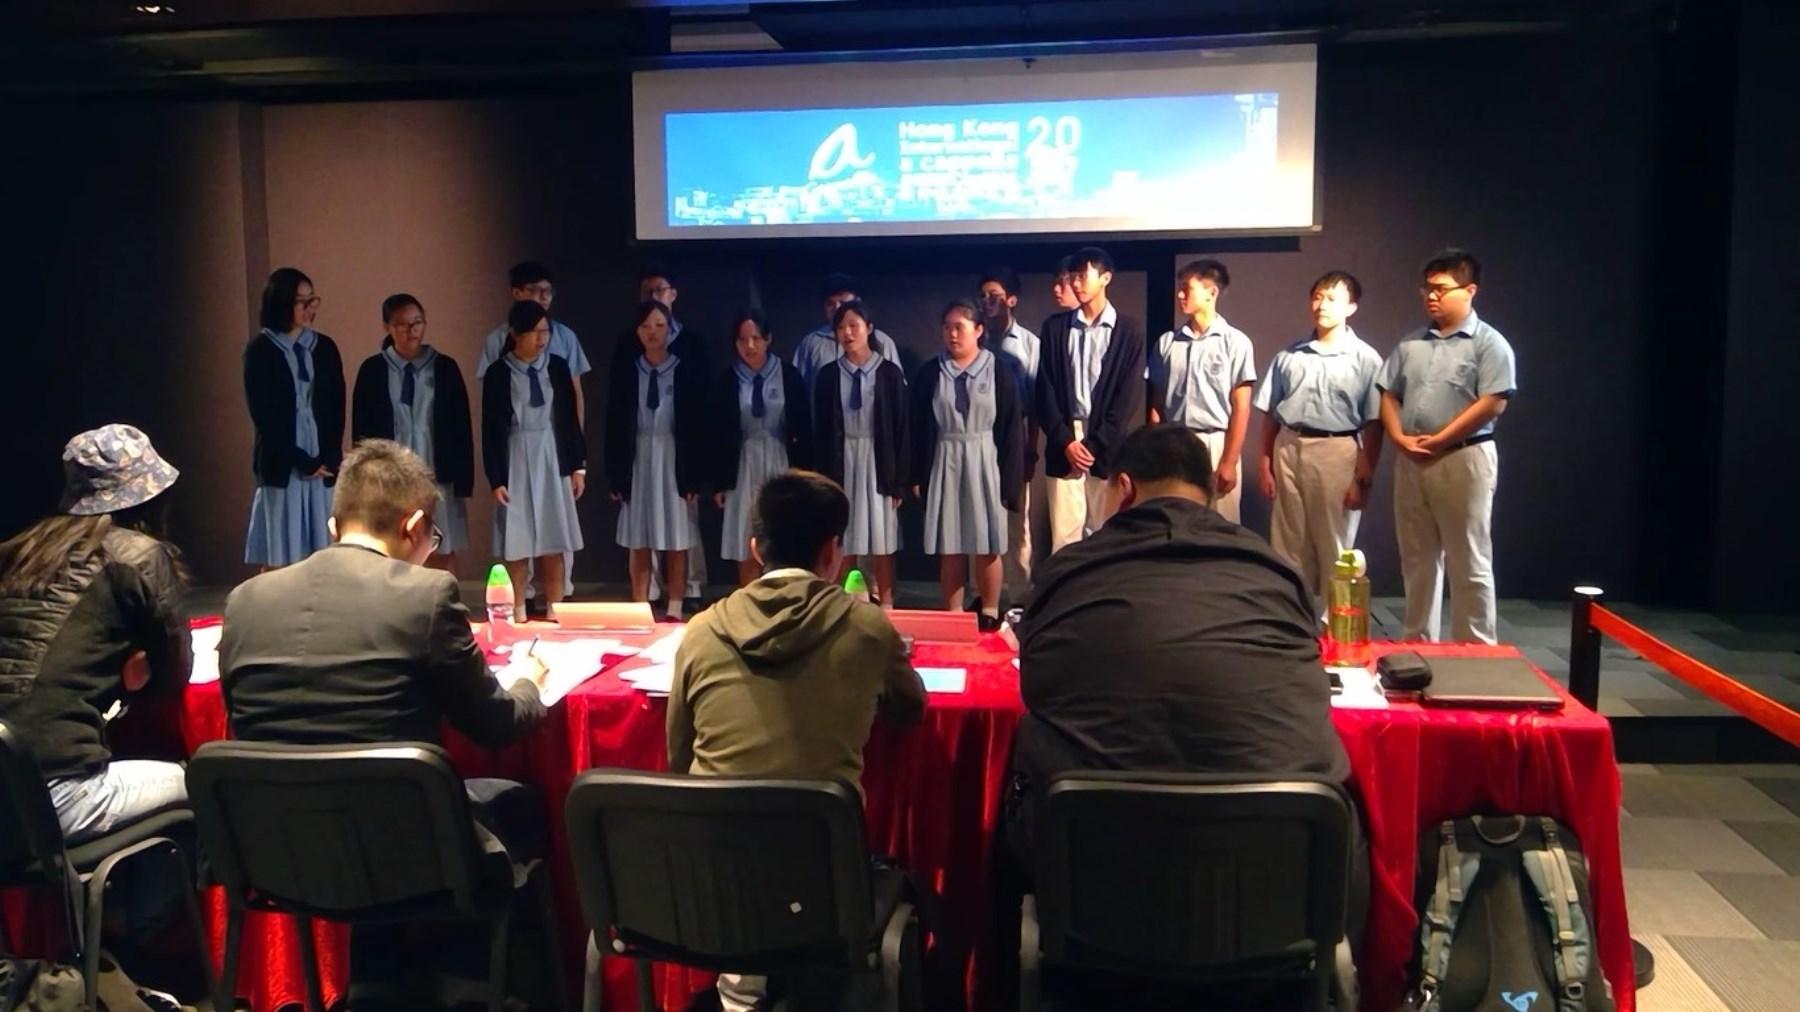 http://npc.edu.hk/sites/default/files/003_5.jpg